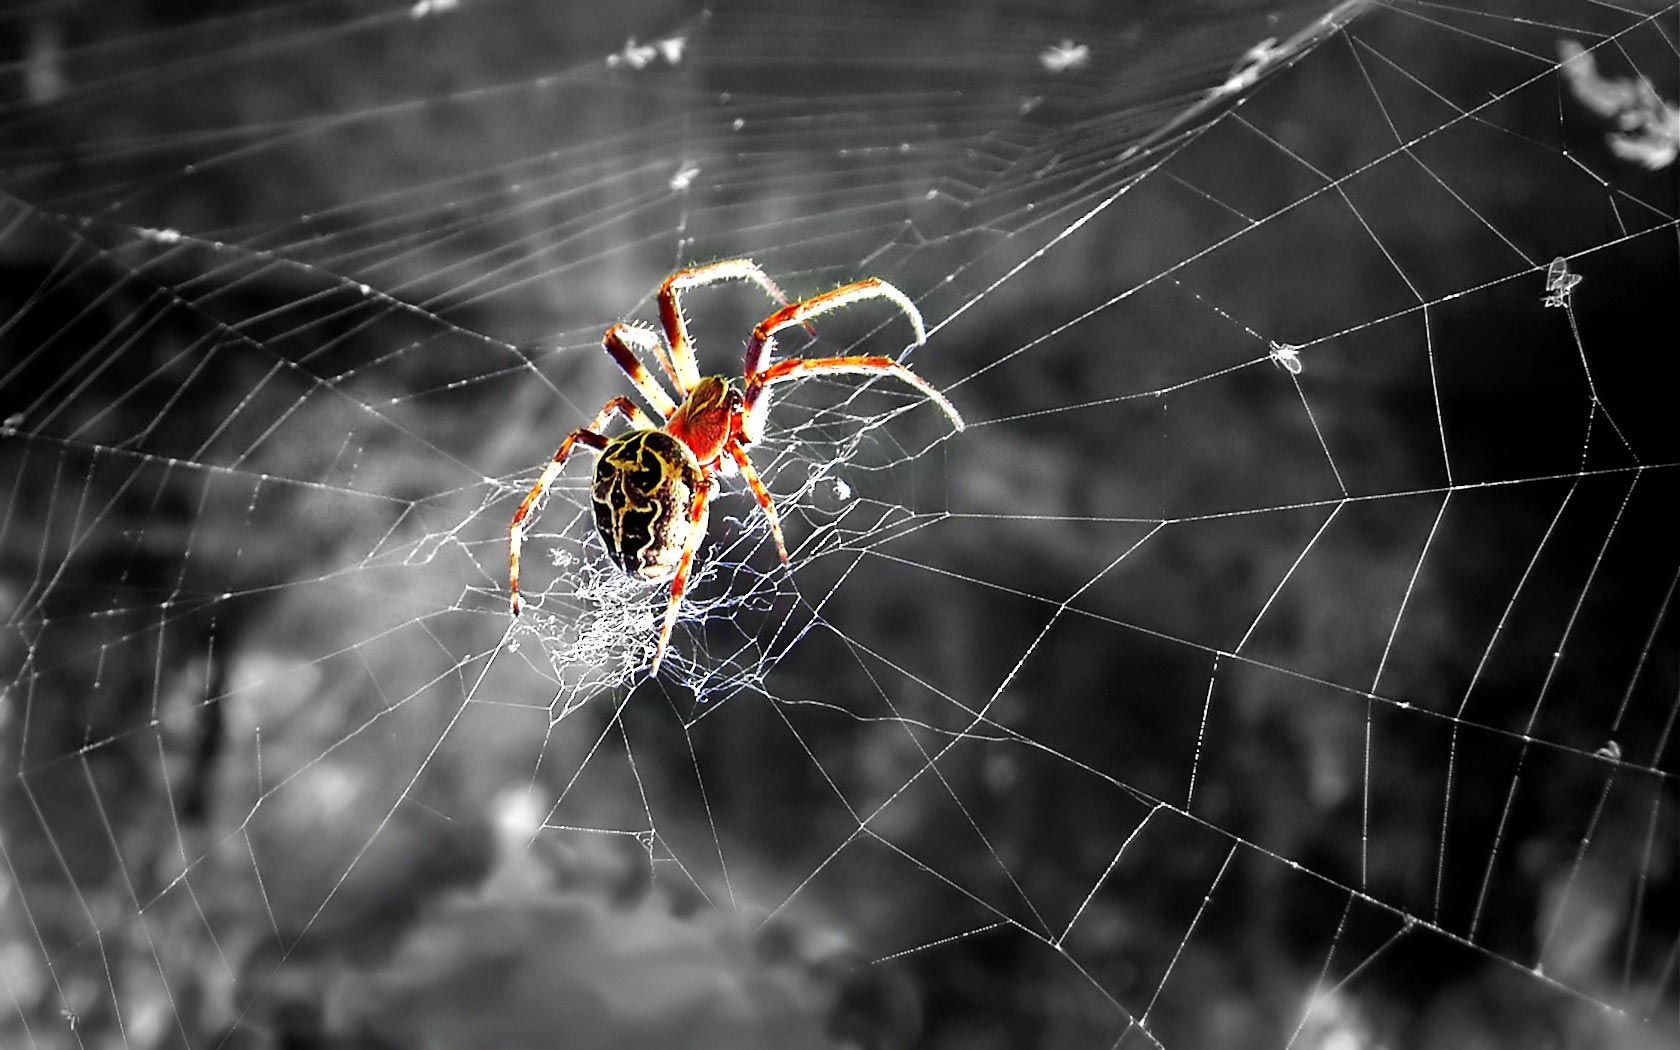 Spider Wallpaper Desktop Background Cfv Spider Spiders Scary Animal Wallpaper